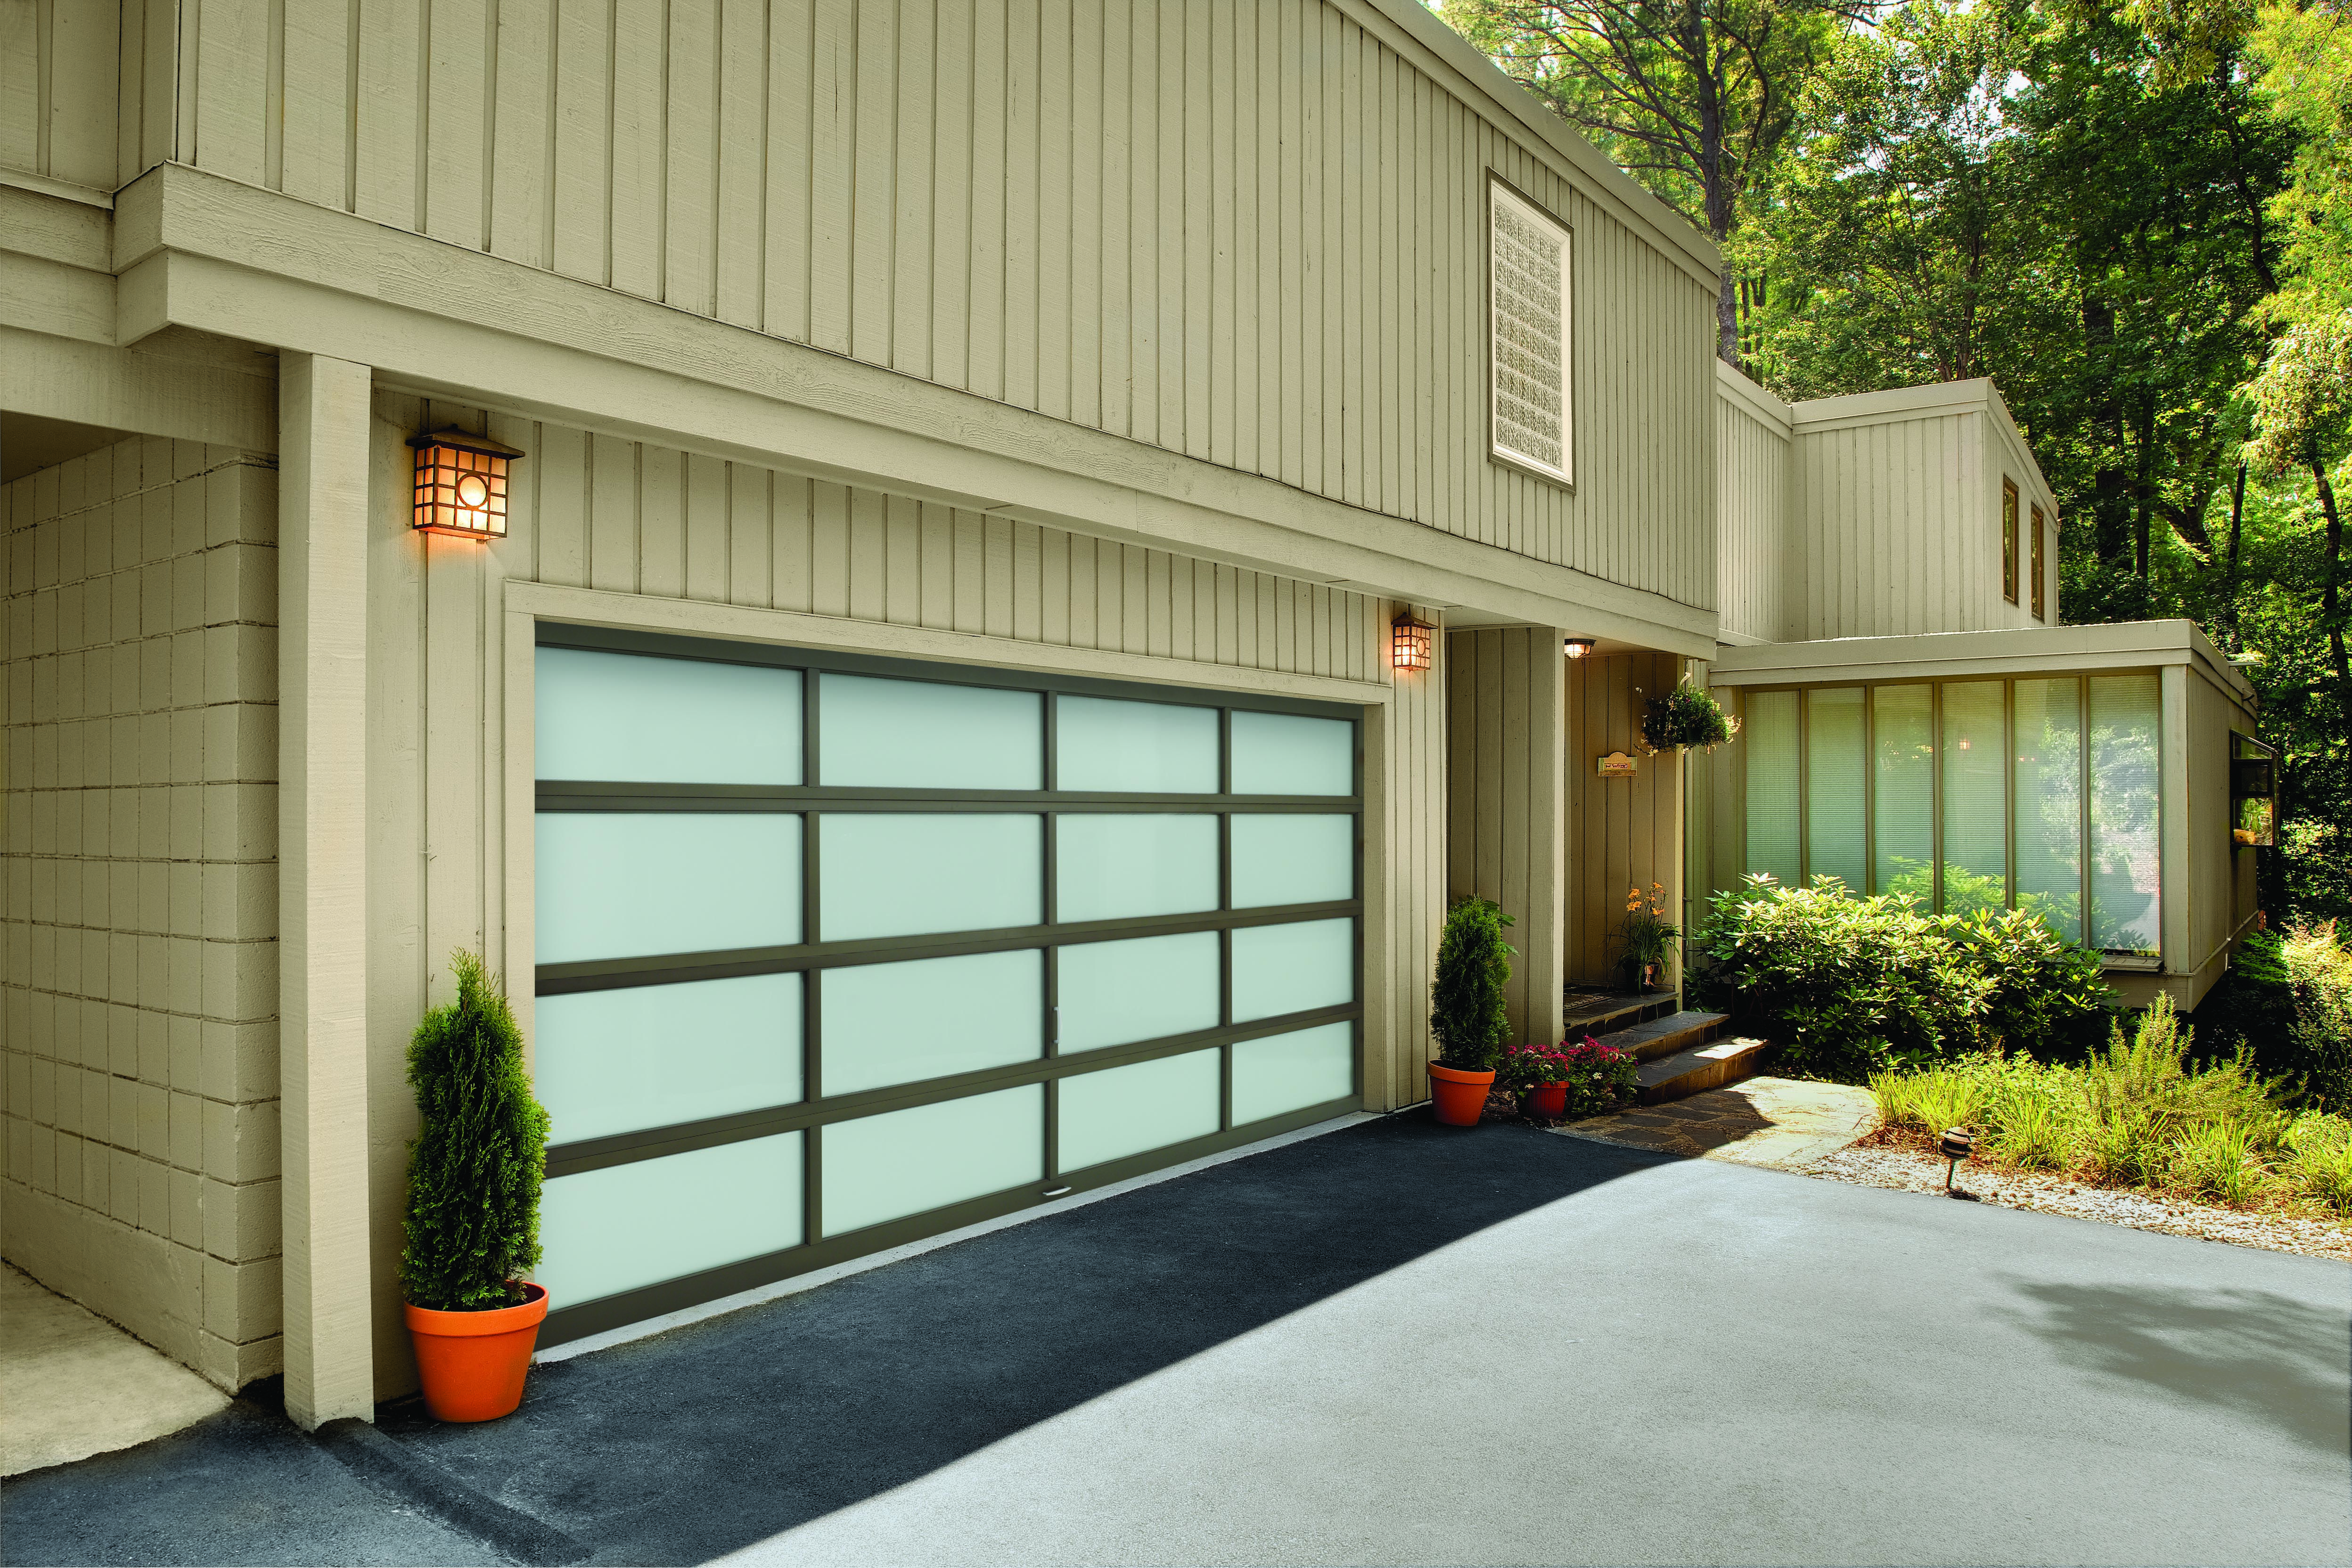 Amarr 16u0027x7u0027 Vista Garage Door With Textured Bronze Frame And Frost Glass.